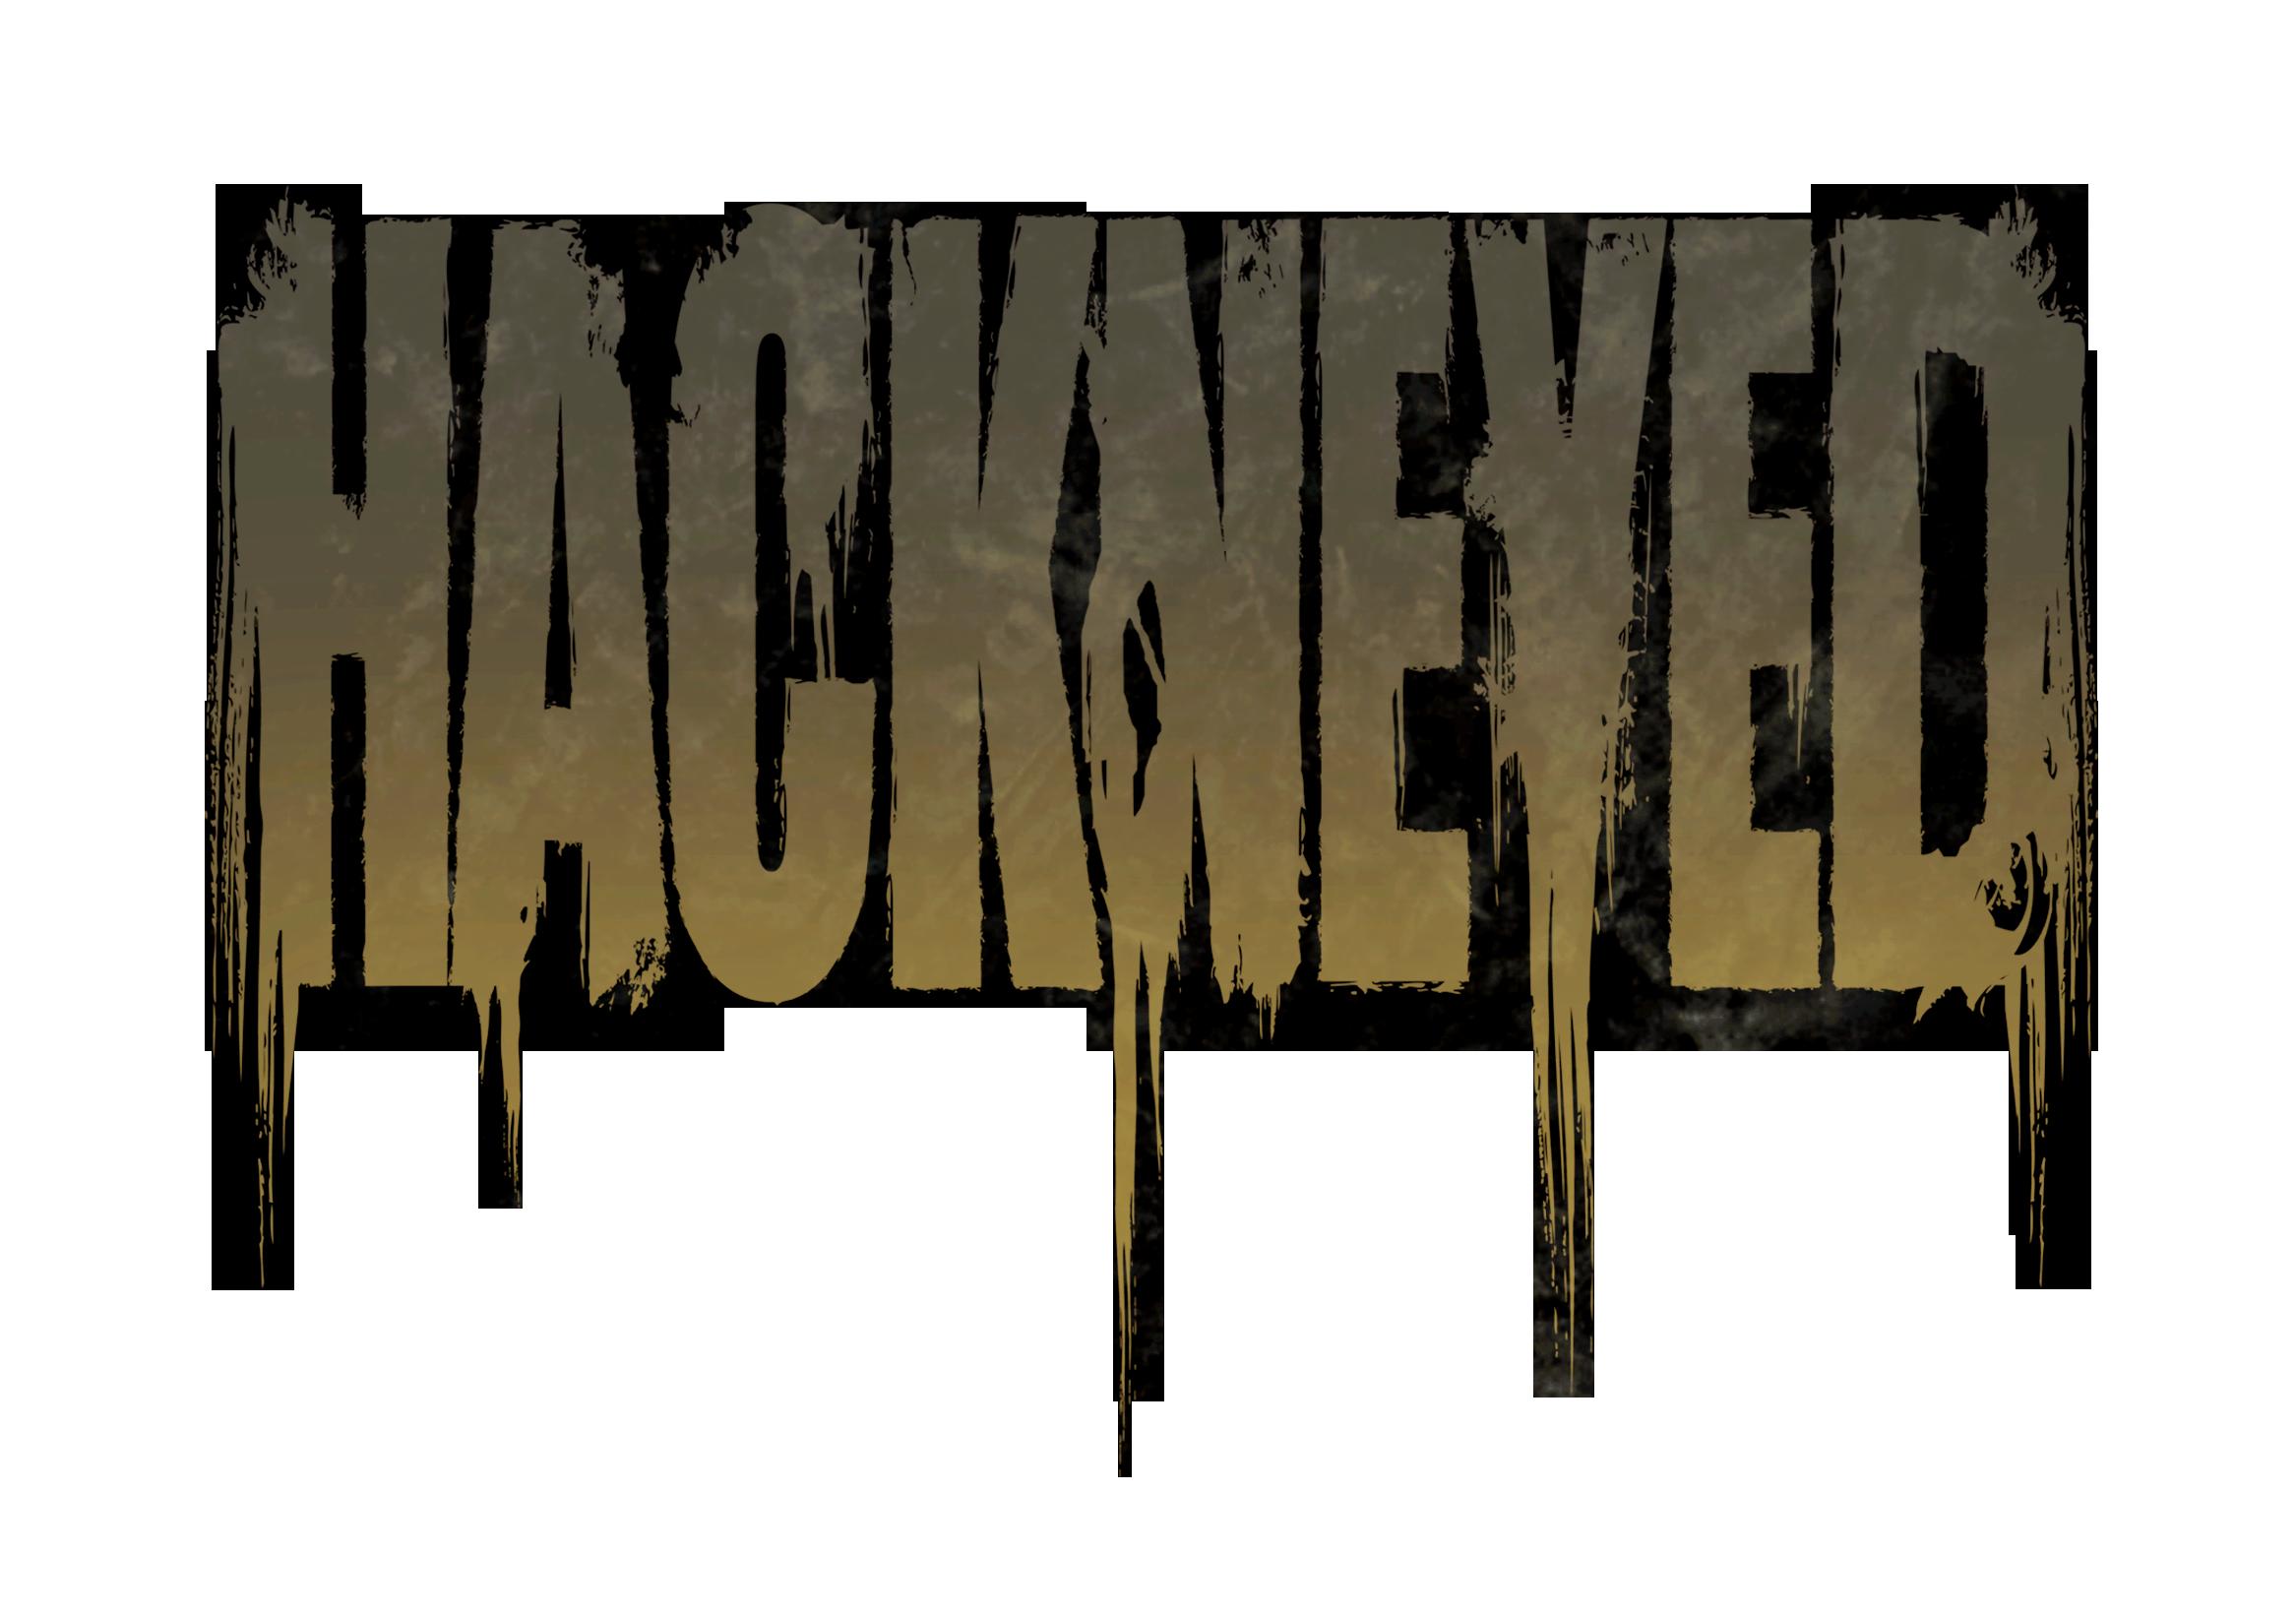 Hackneyed PNG-PlusPNG.com-2333 - Hackneyed PNG